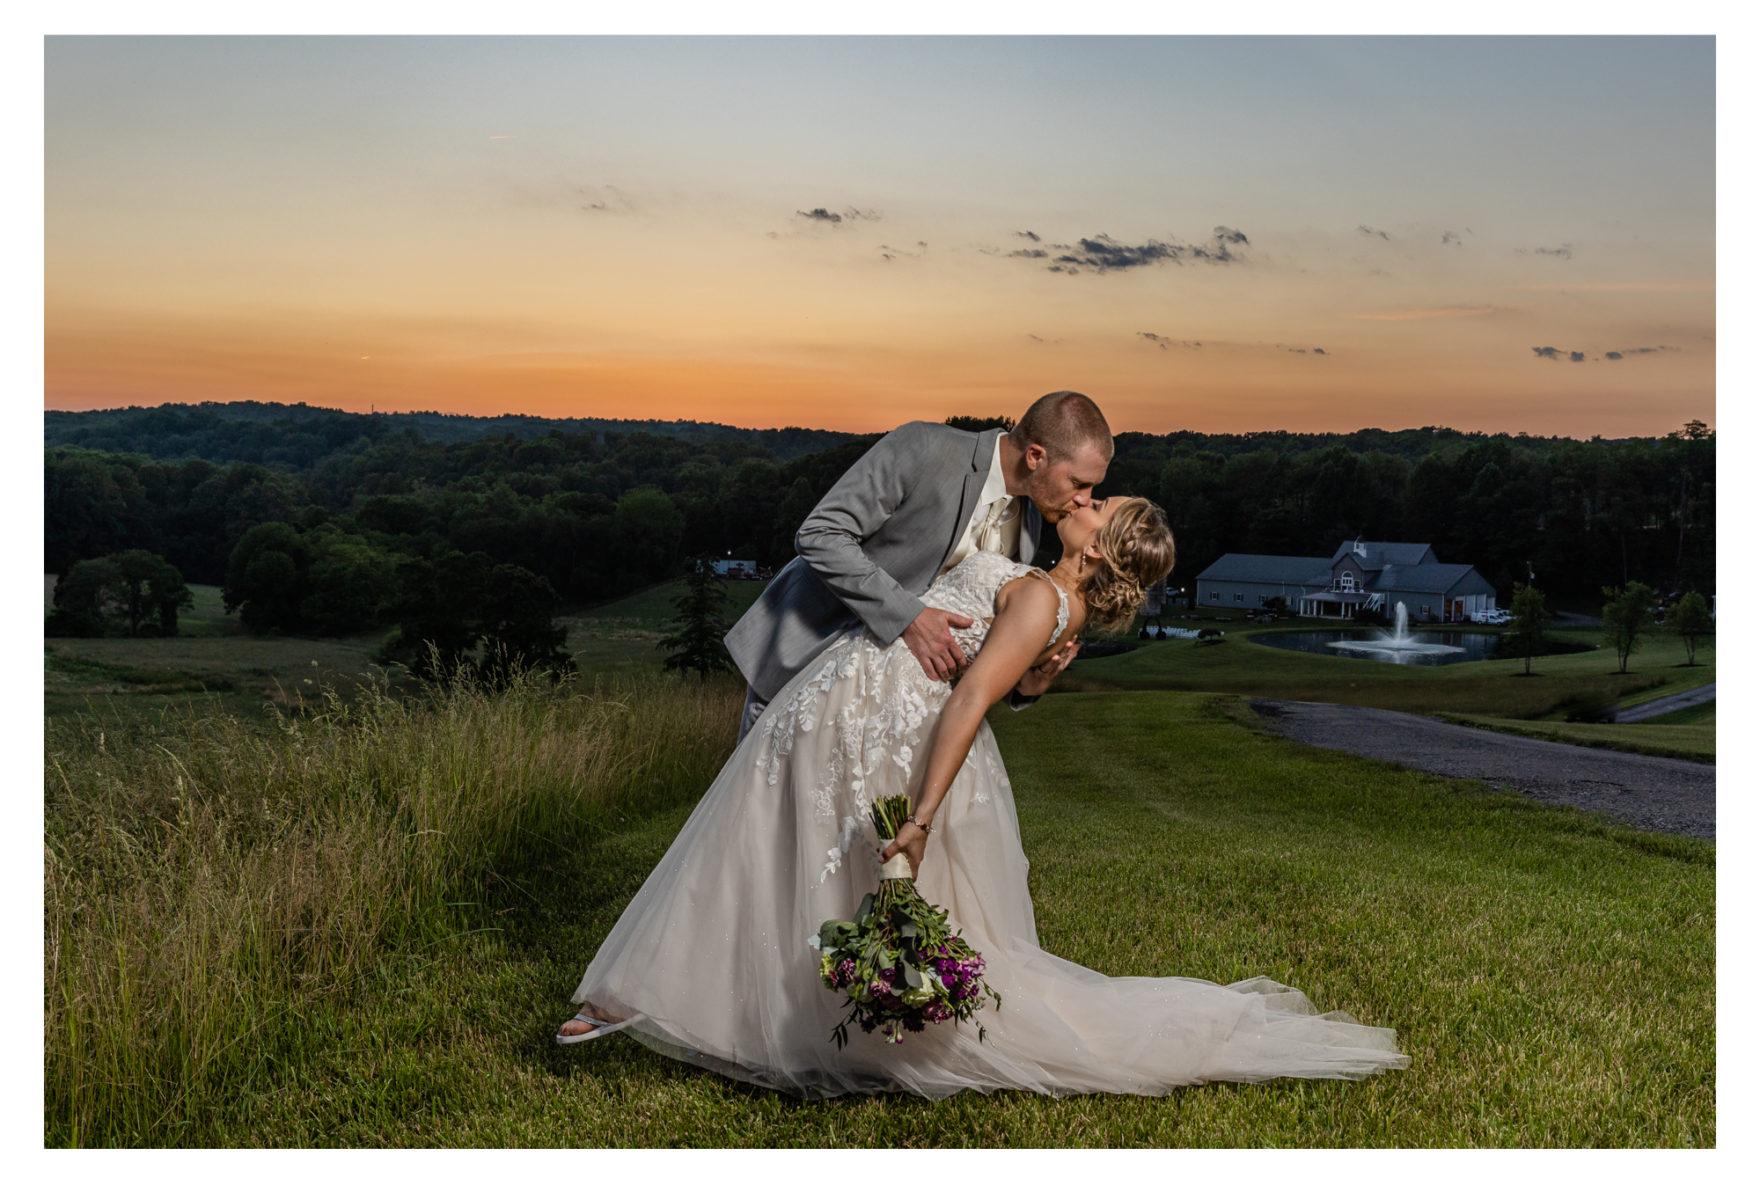 Summer Wedding Stone Ridge Hollow June Wedding Lavender dresses bride and groom sunset photo